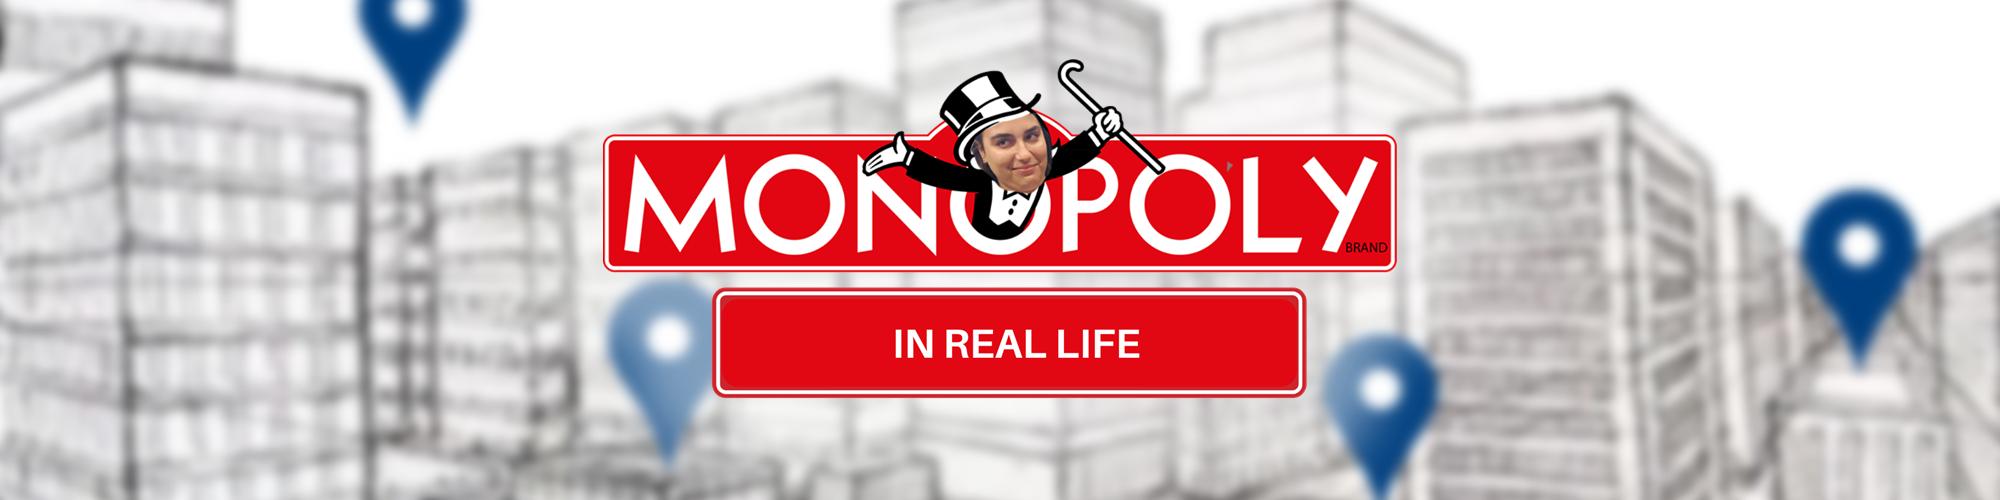 Real-Life Monopoly